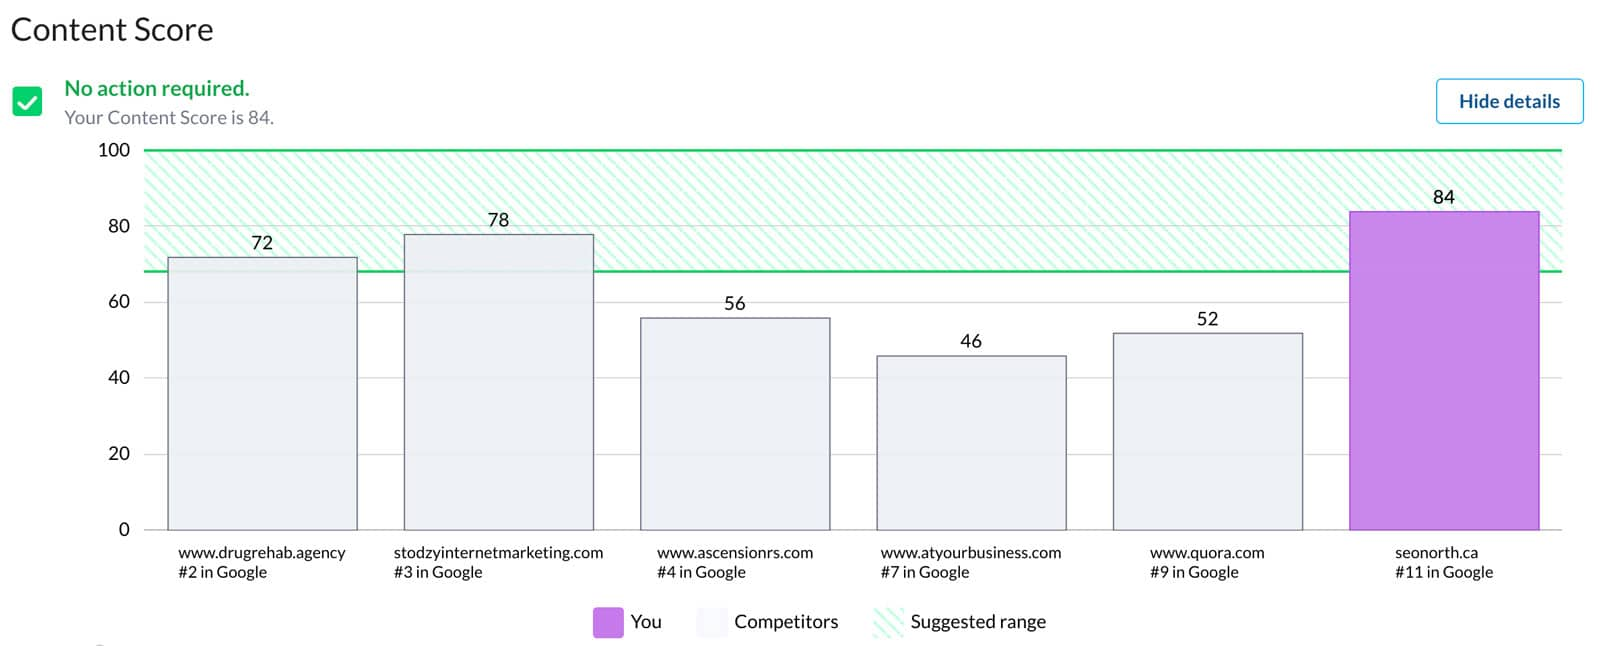 Correlating Search Engine Optimization